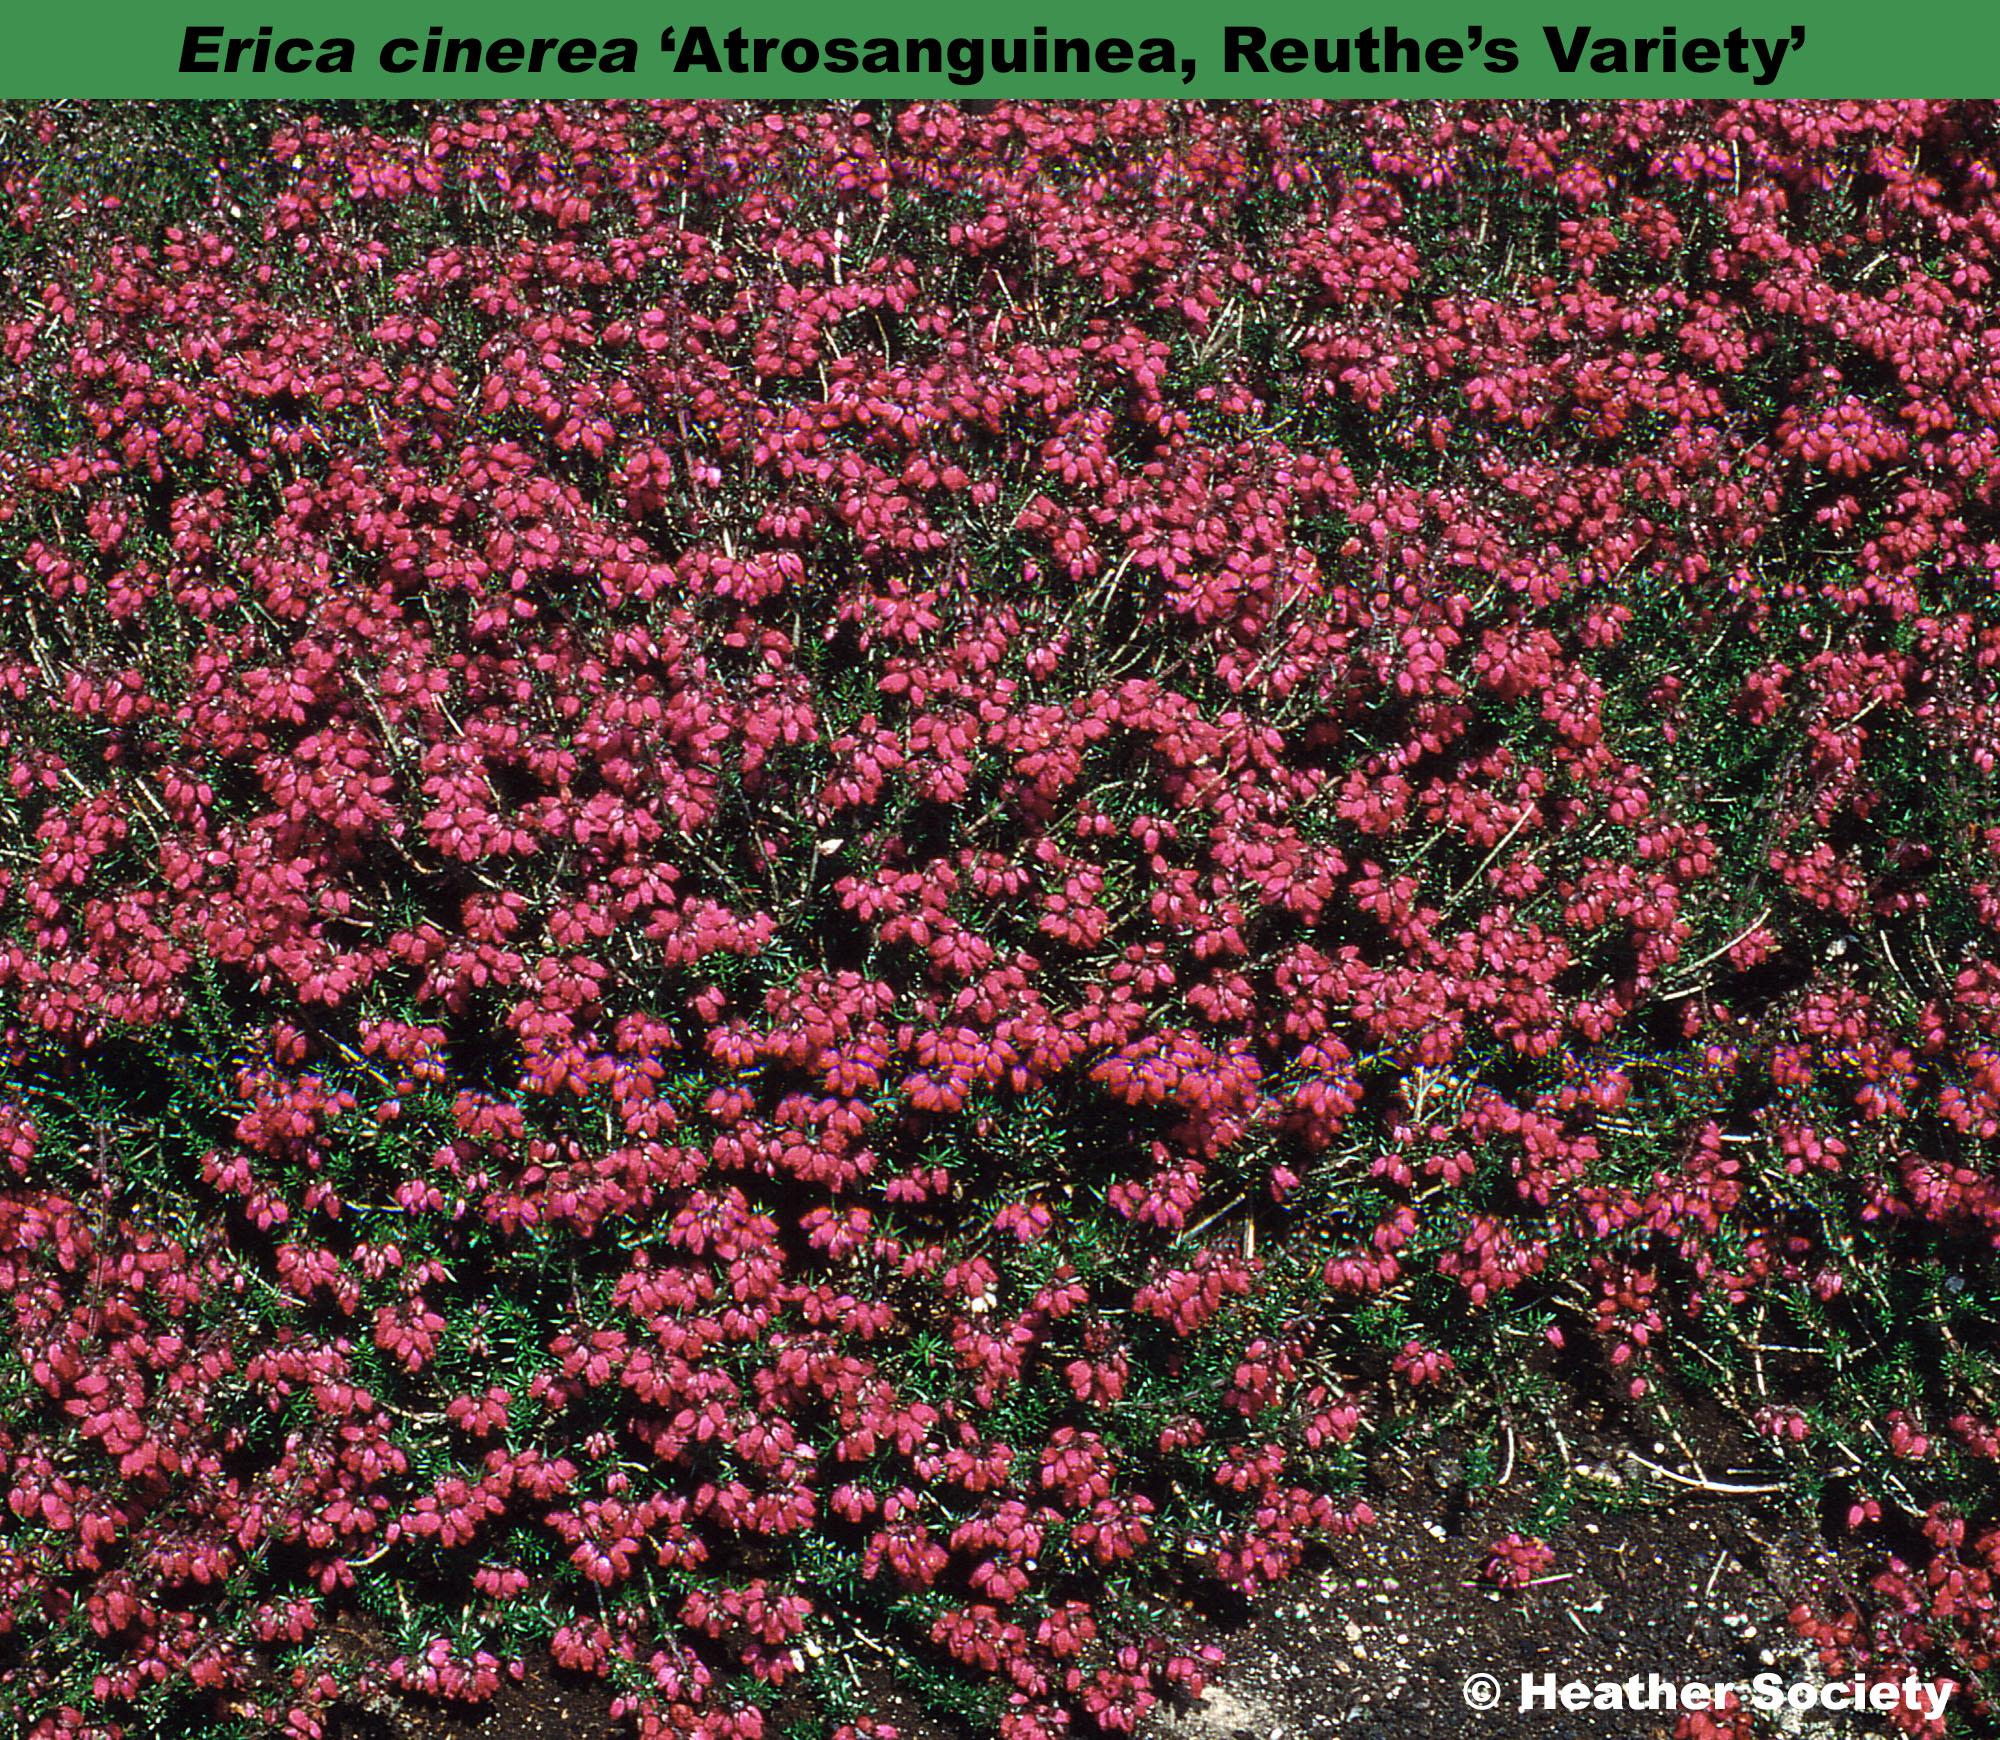 'Atrosanguinea, Reuthe's Variety'